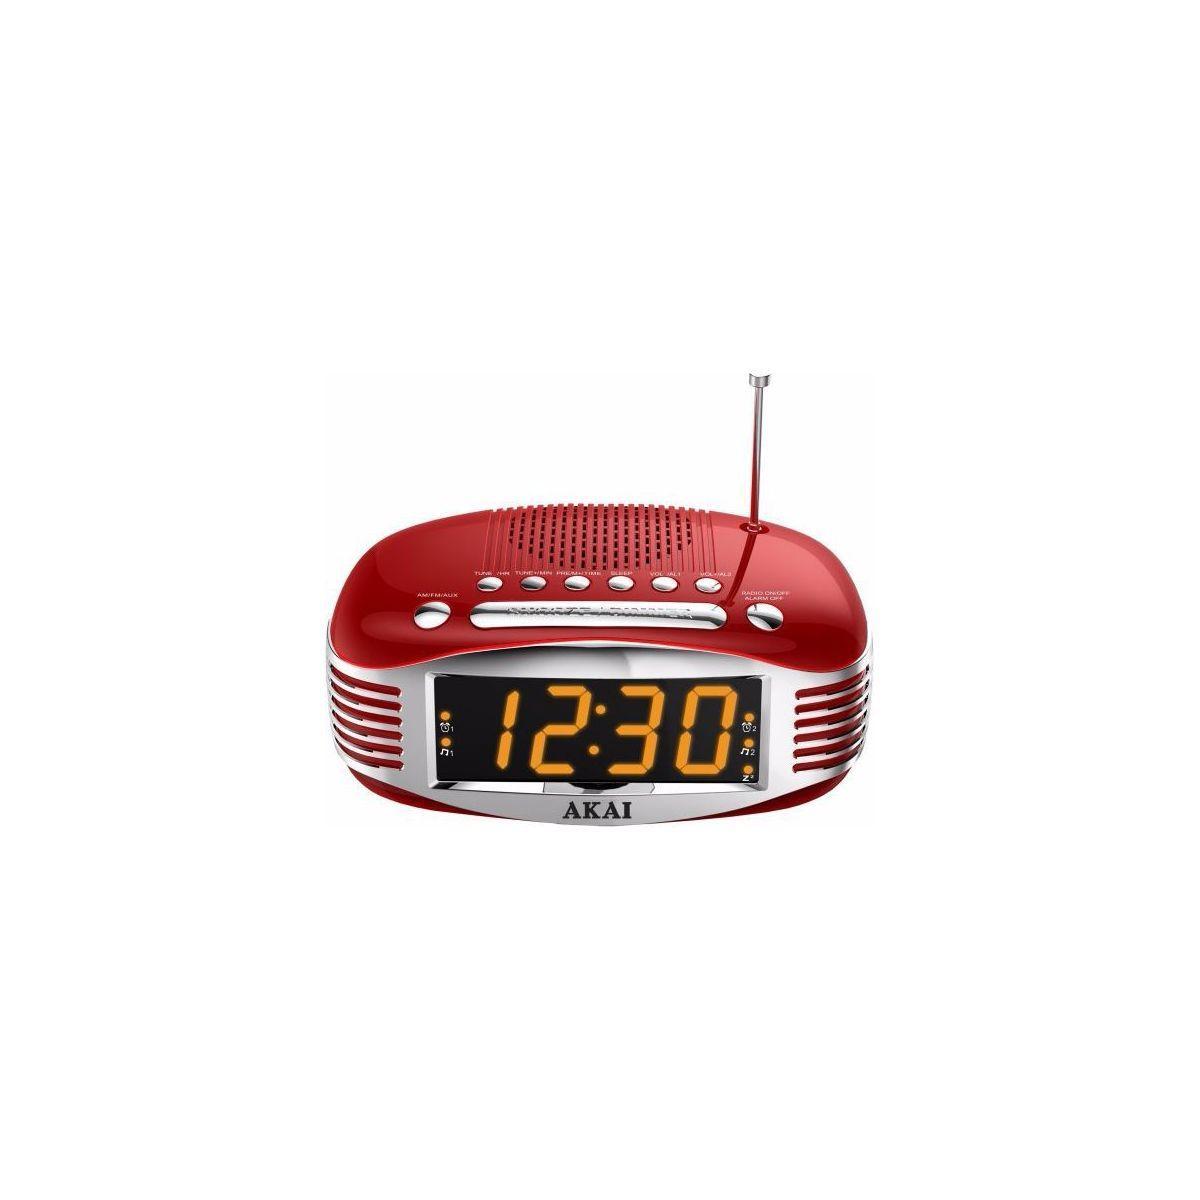 Radio r�veil akai ar400 rouge - 2% de remise imm�diate avec le code : school2 (photo)